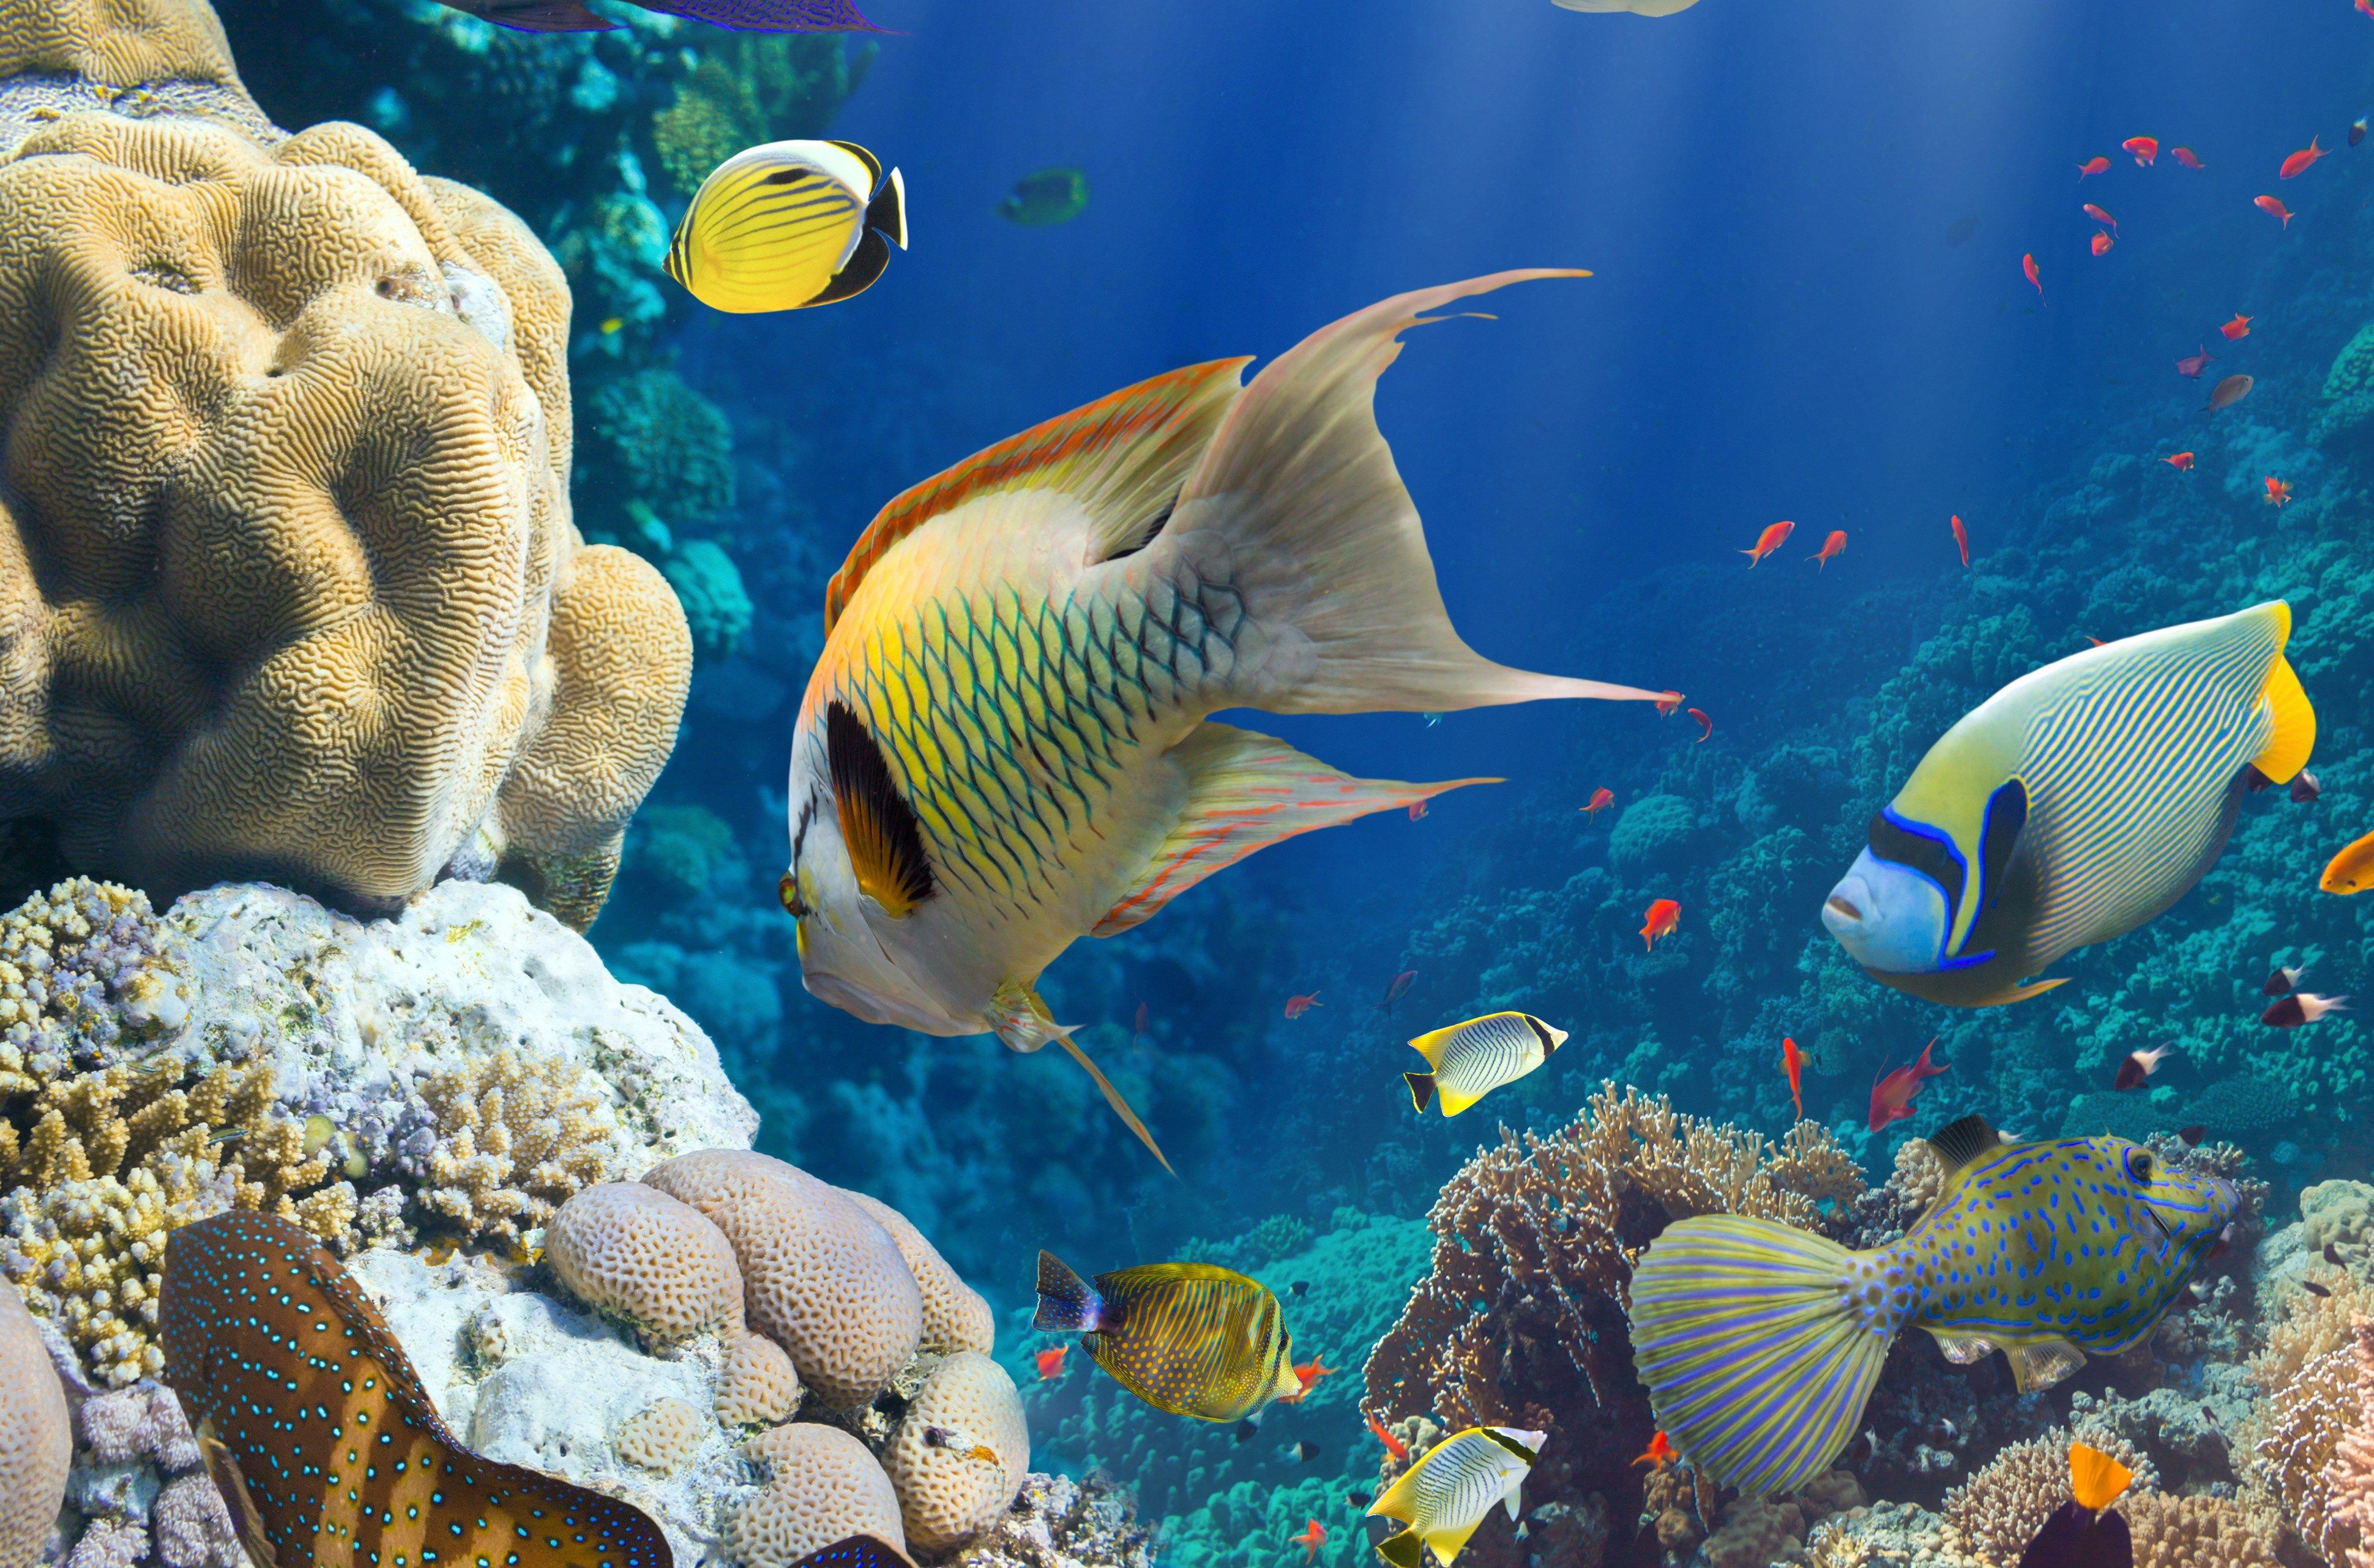 Amazing Fish Underwater Wallpaper Colorful Fish Animals